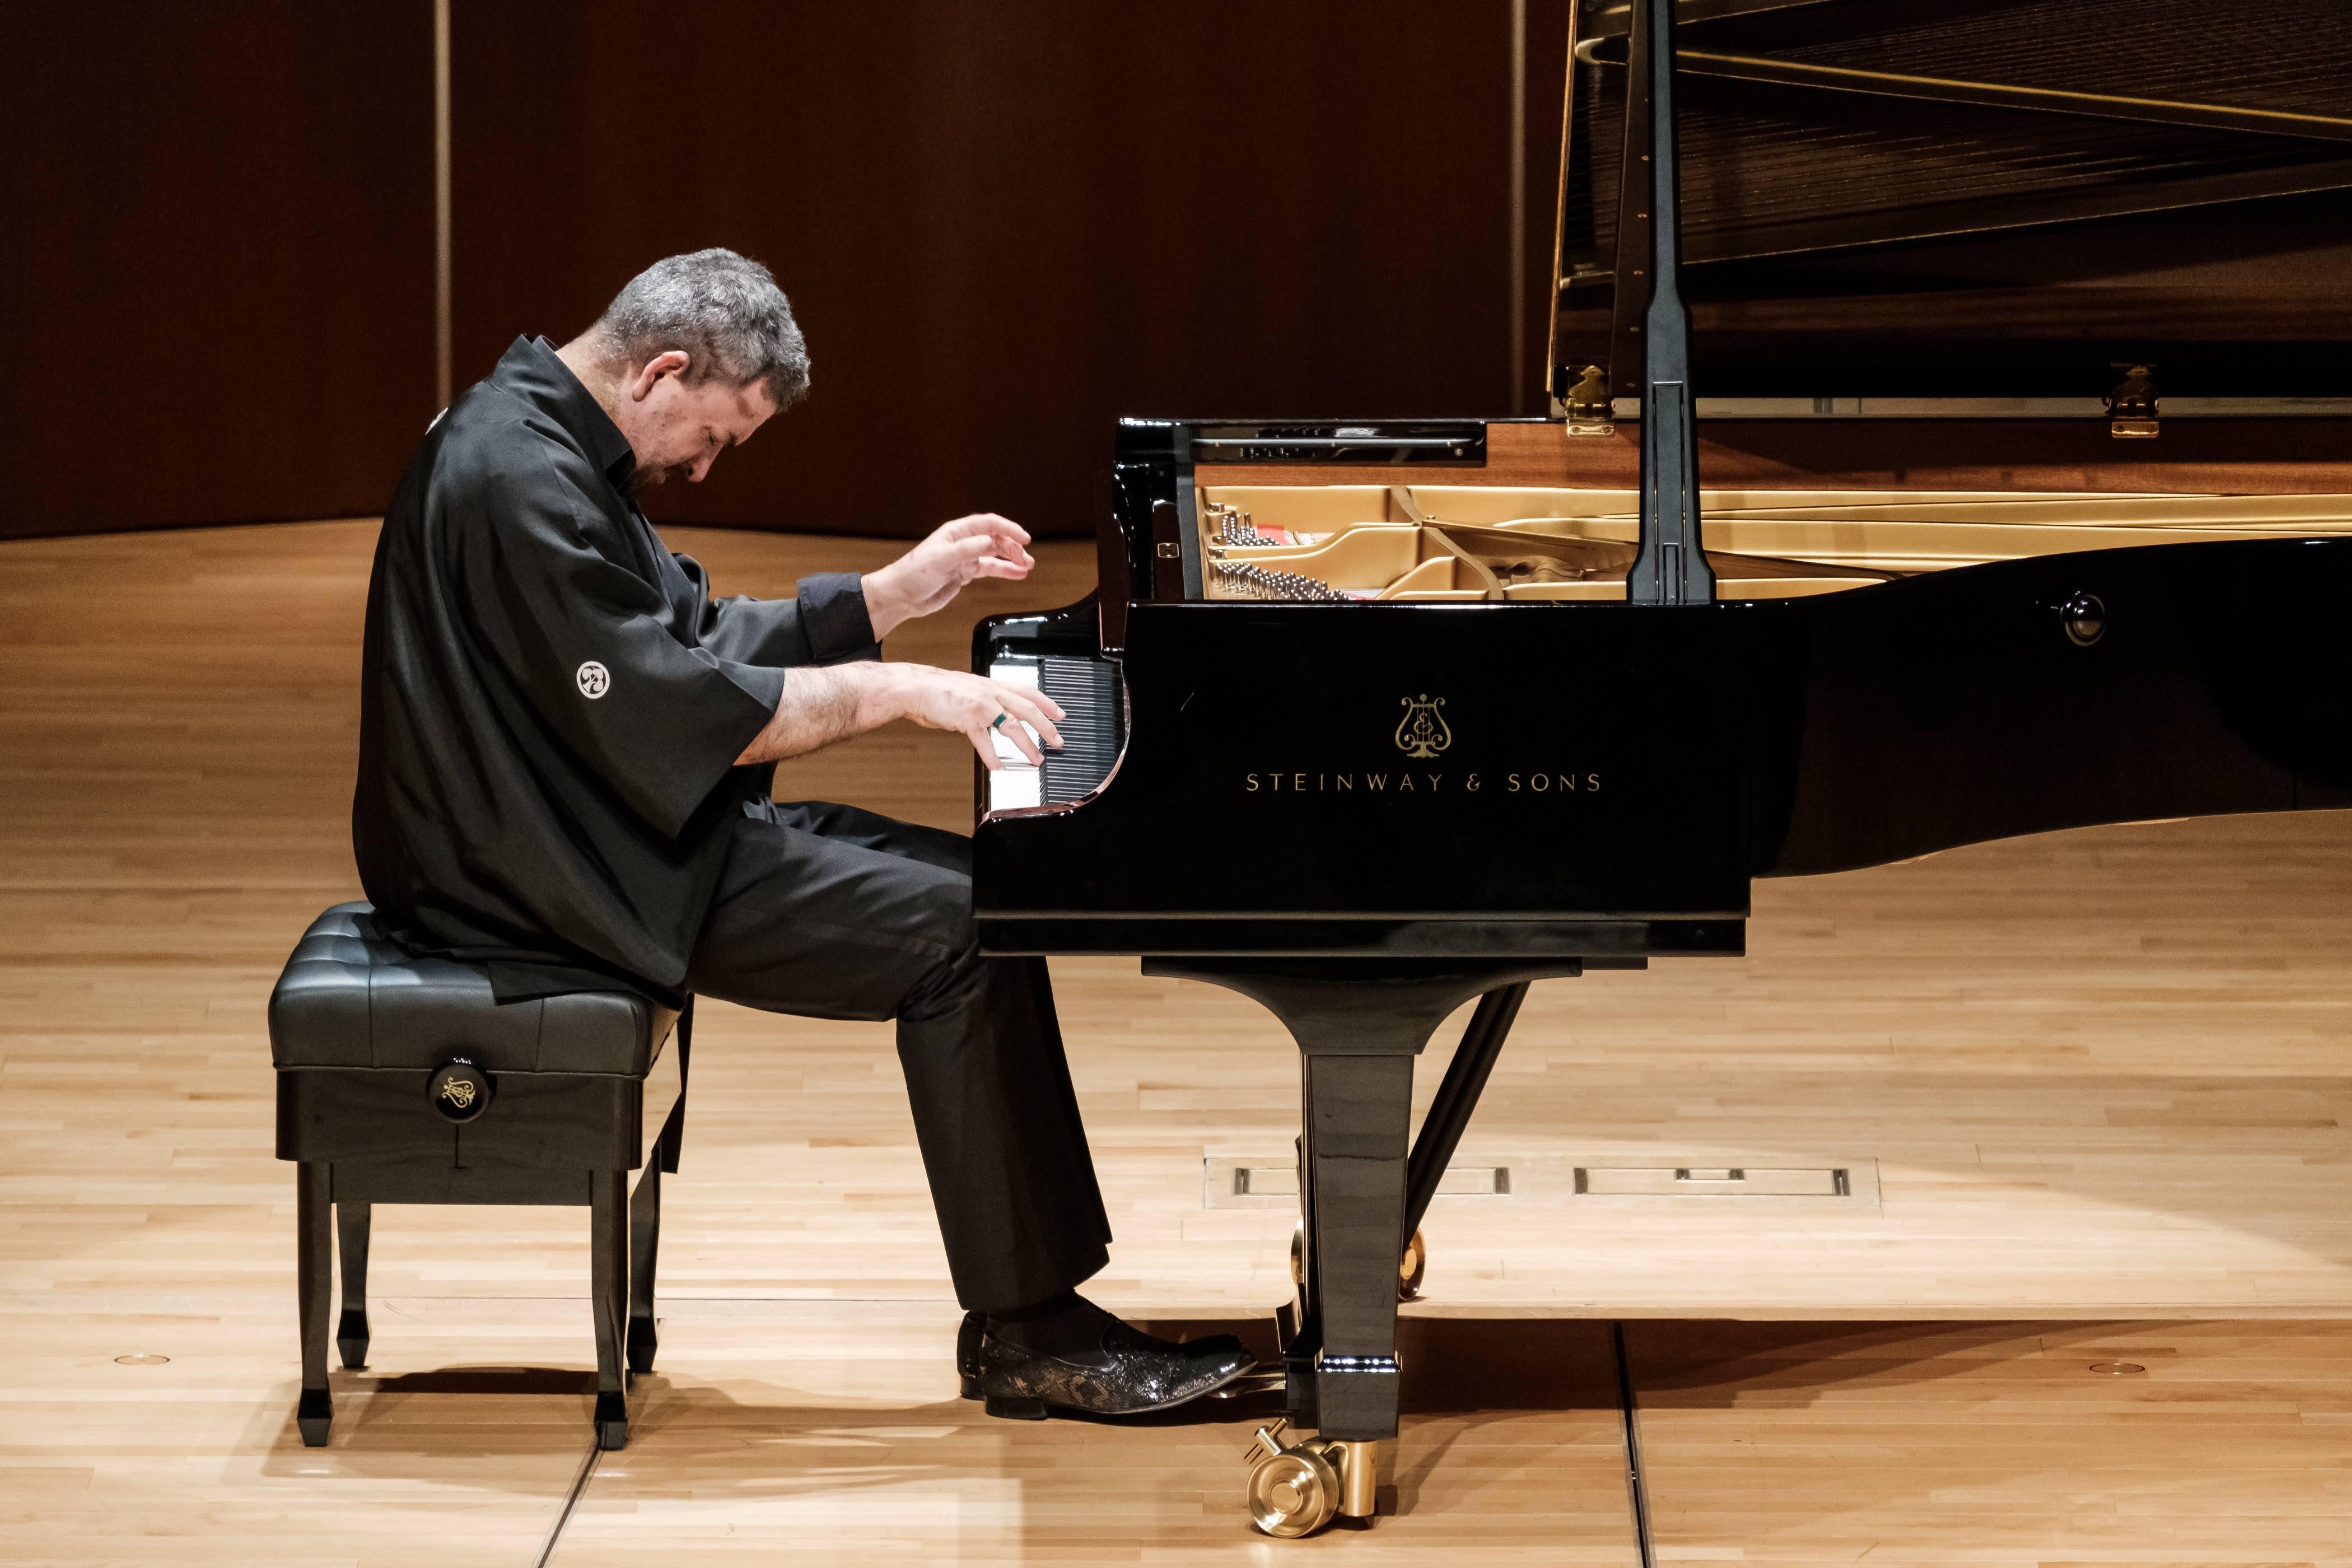 The Immortal 32: Lifschitz's Beethoven Cycle